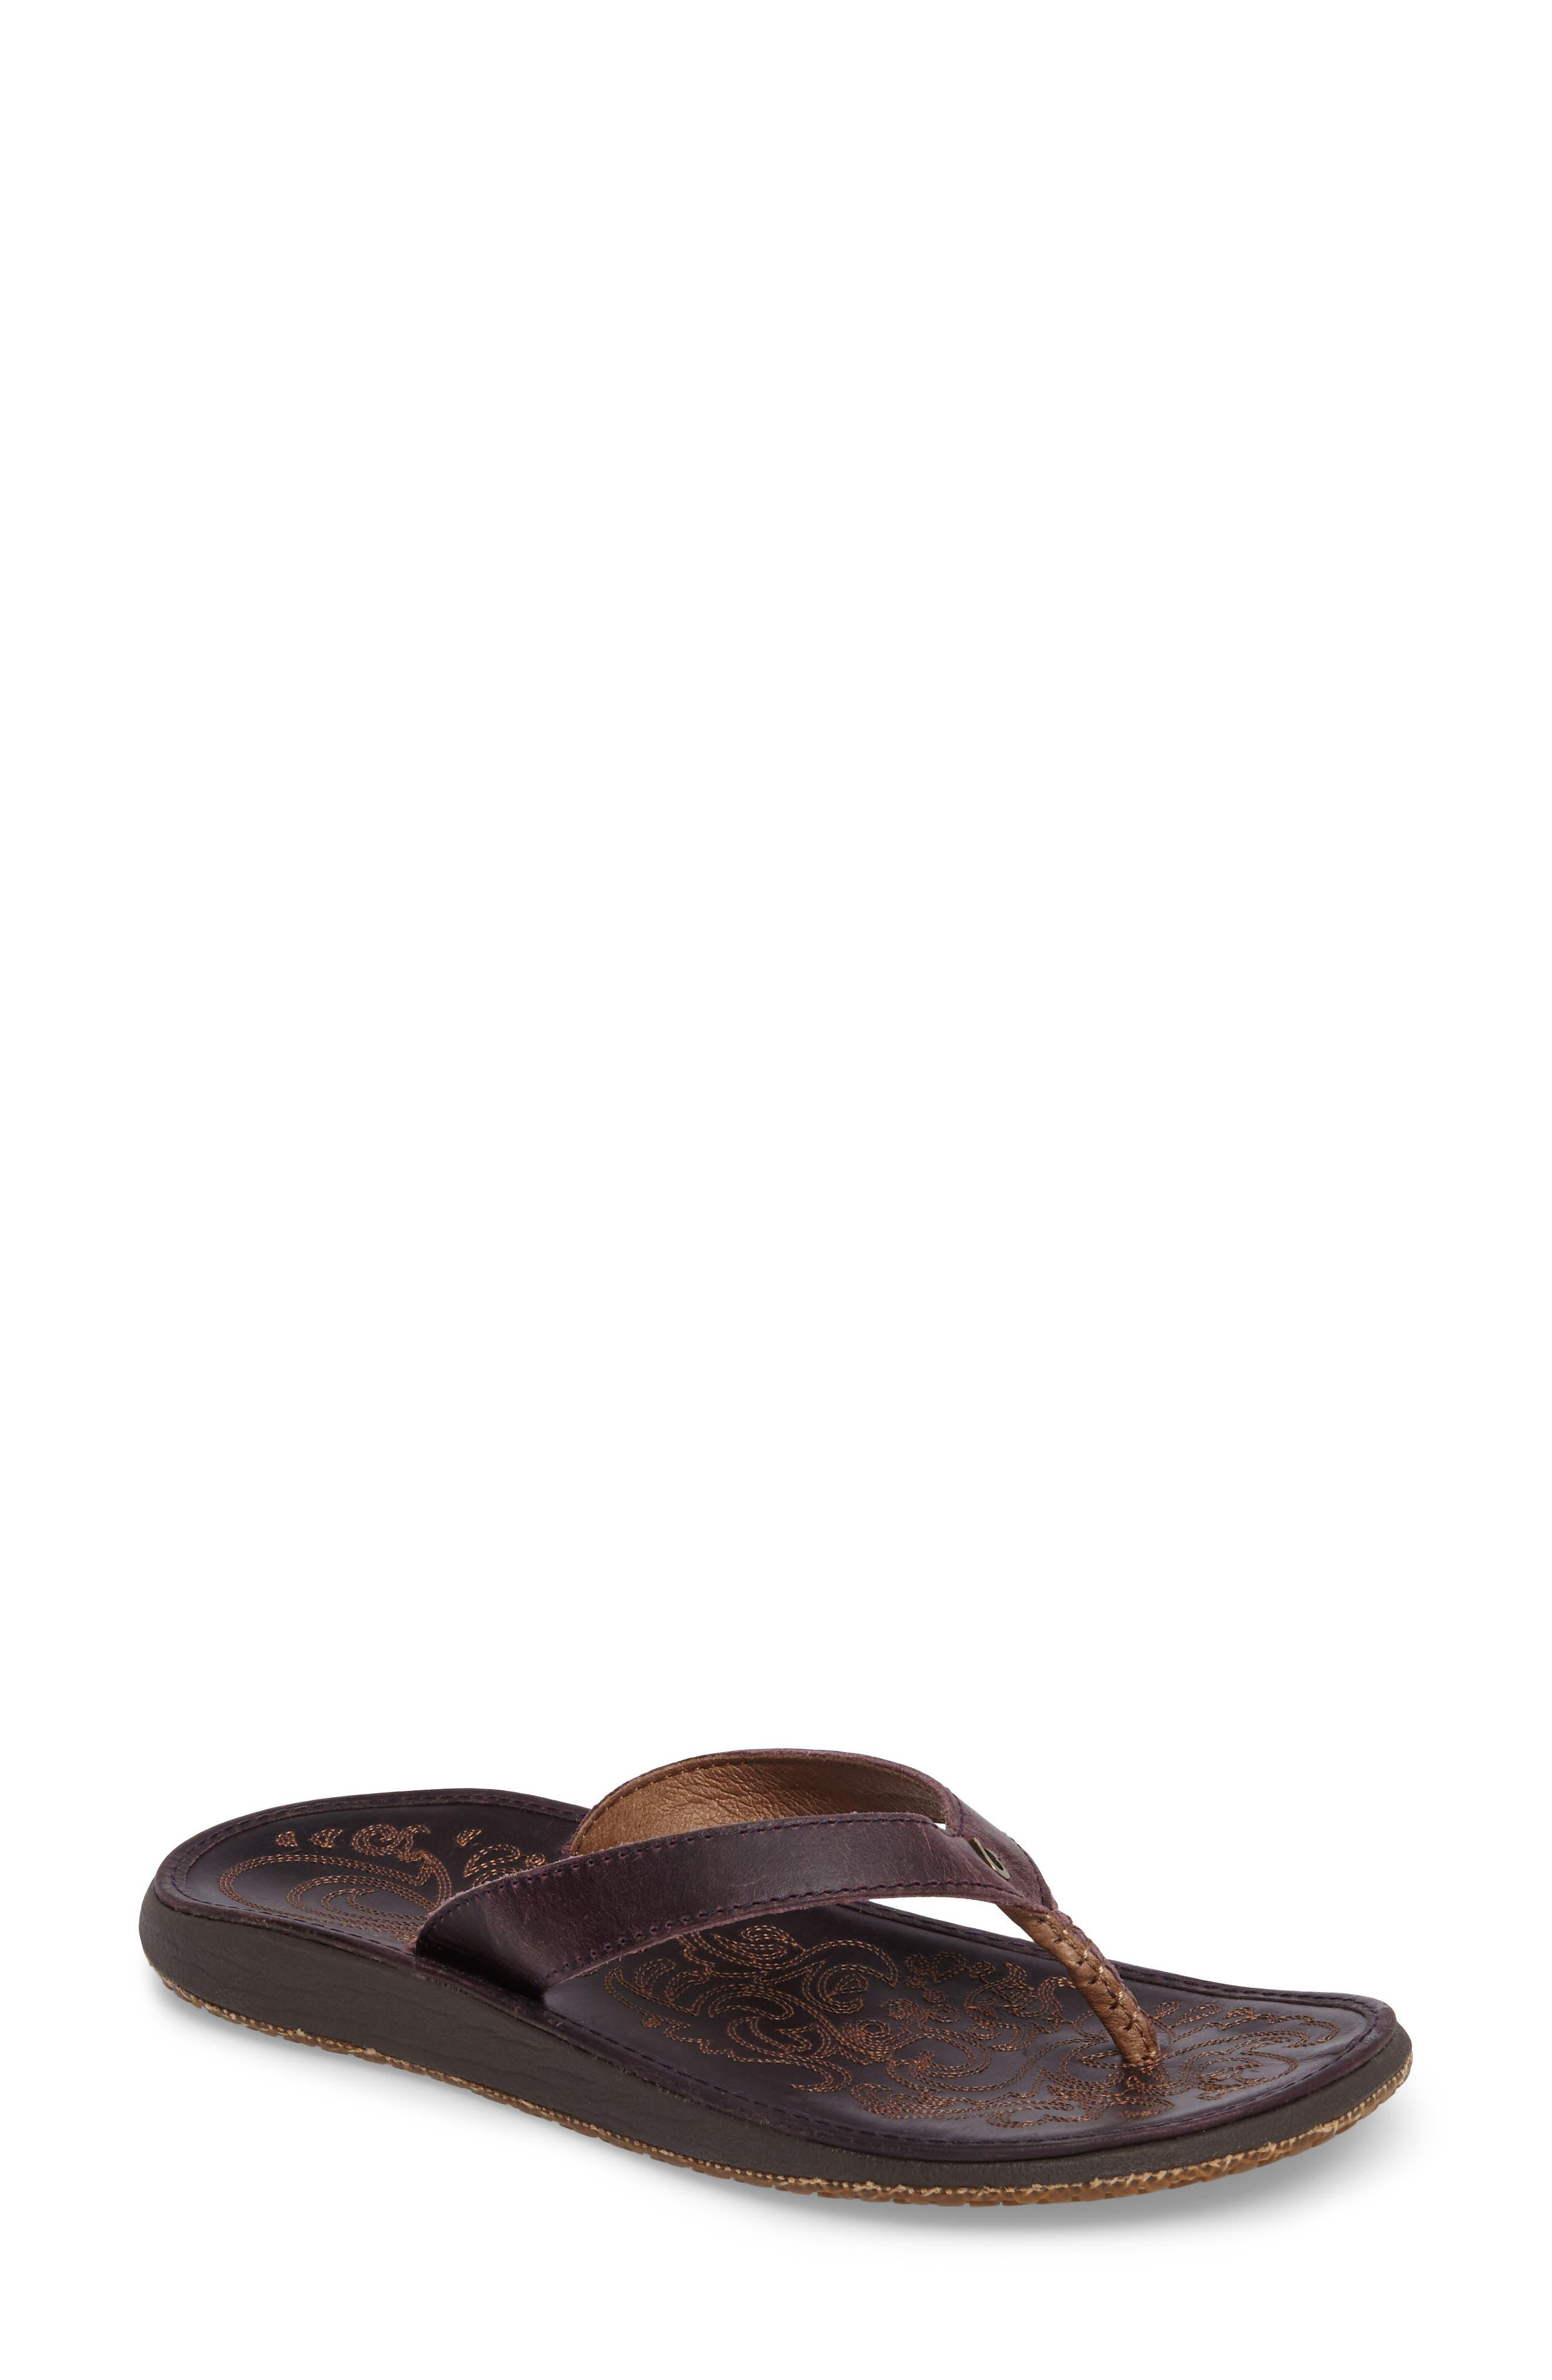 Main Image - OluKai 'Paniolo' Thong Sandal